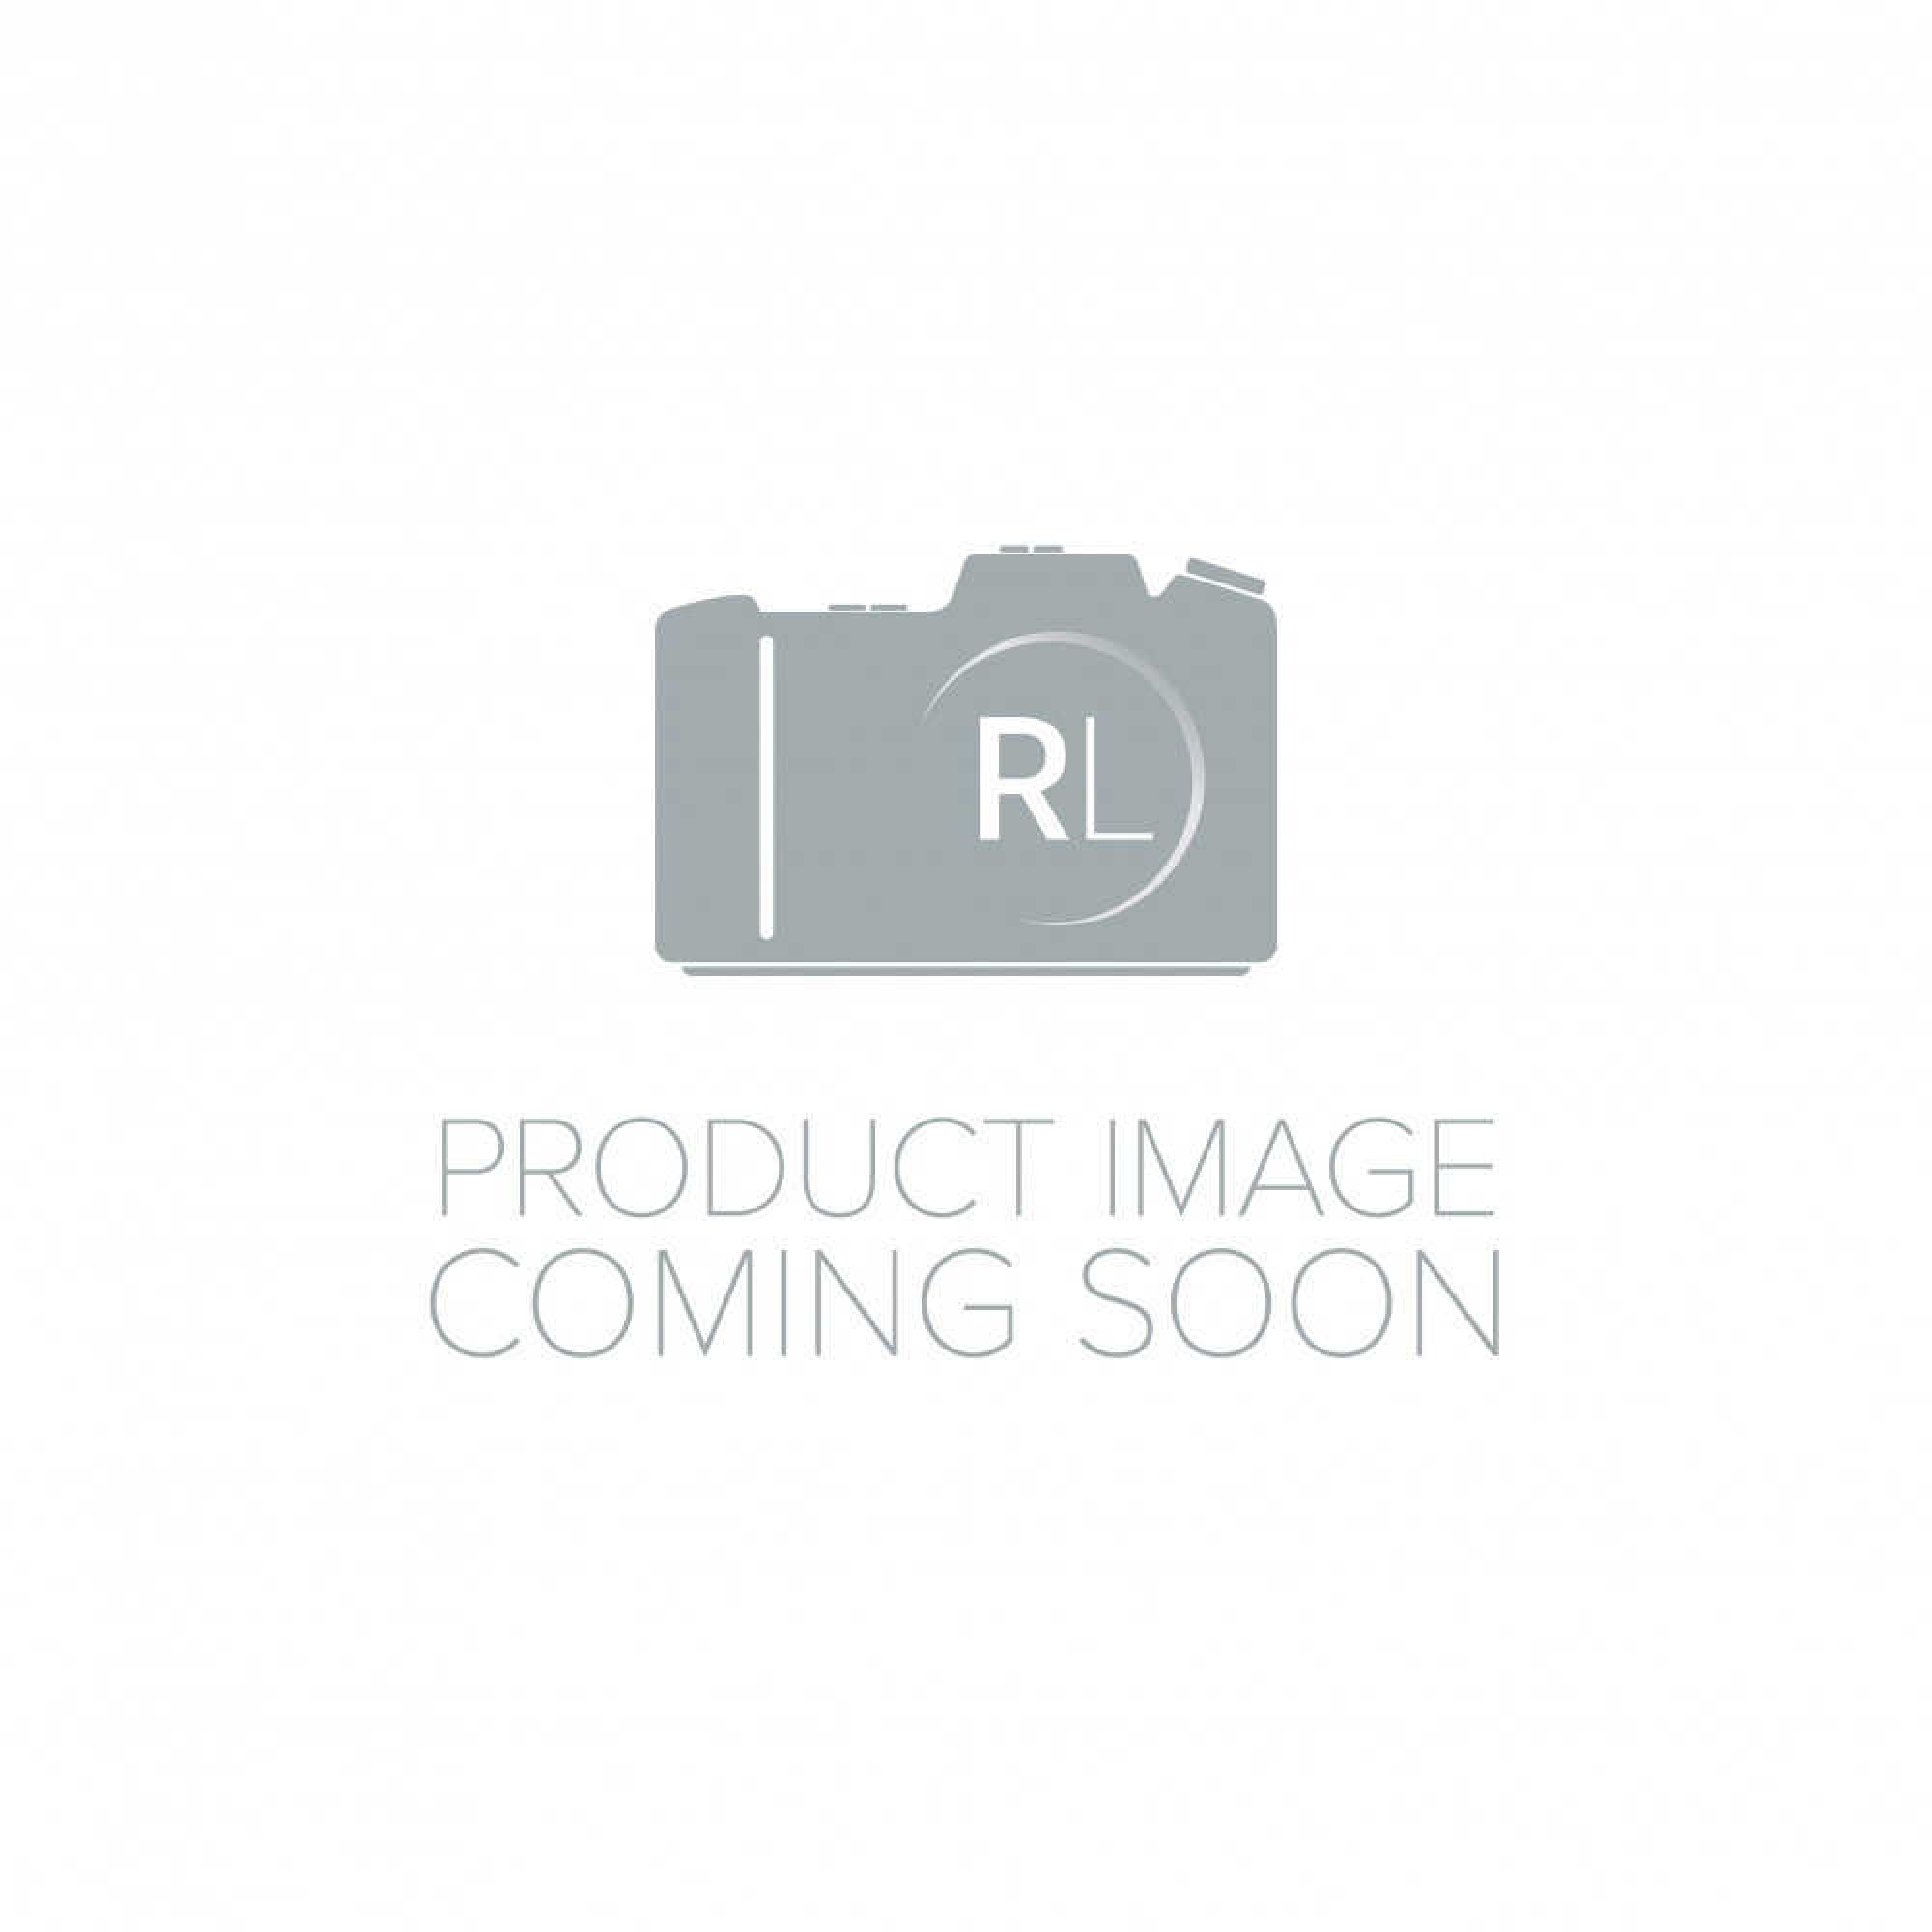 Sylvania - 73885 - LED8.5A19F82710YVRP